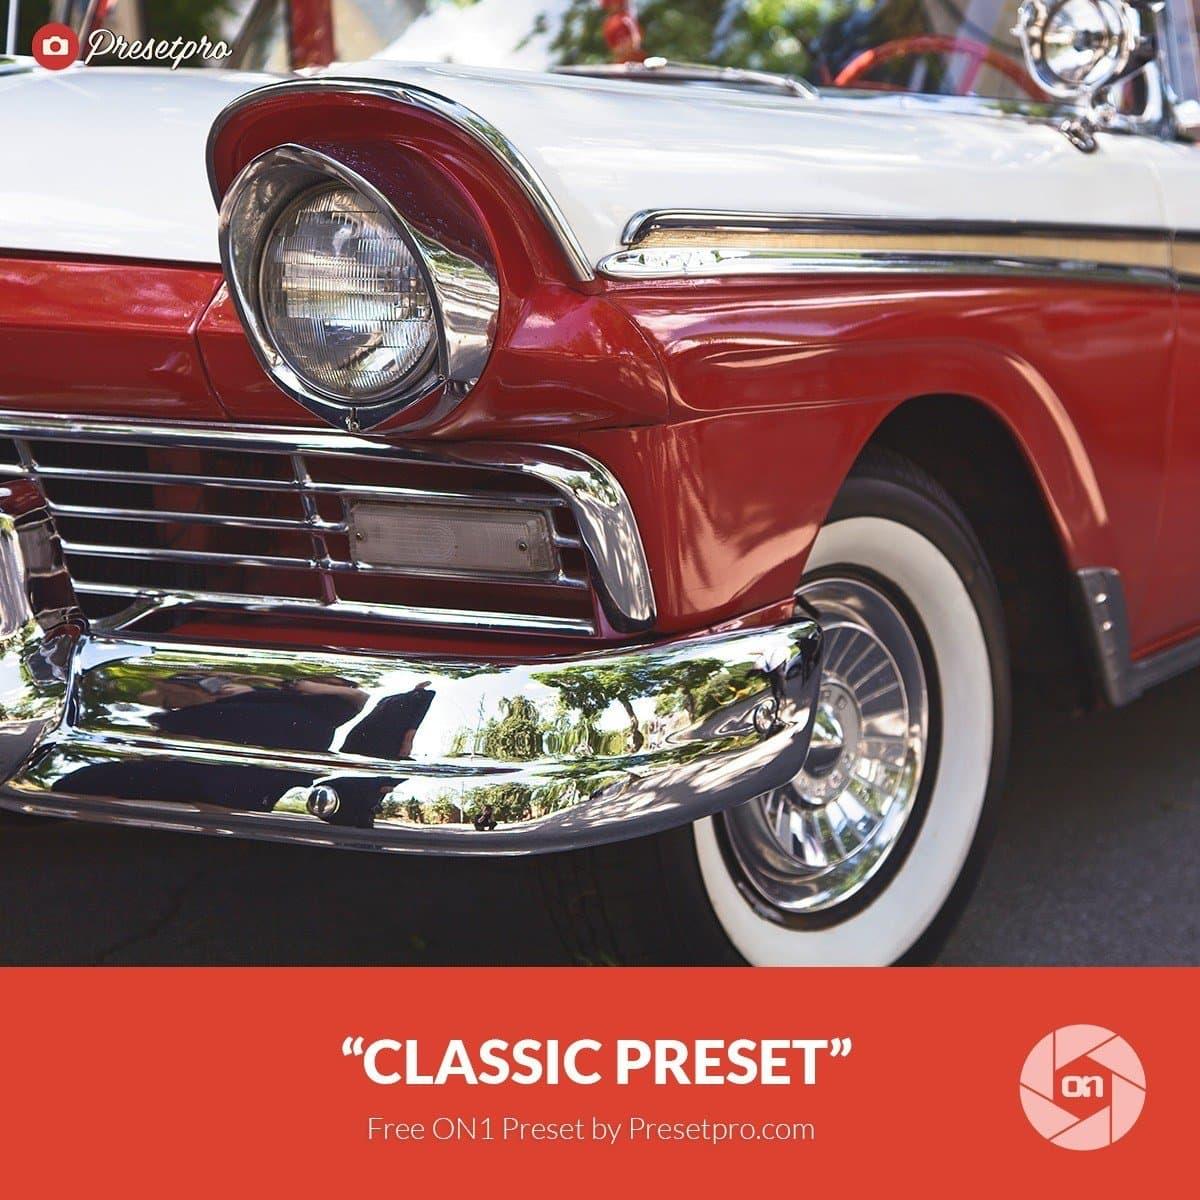 Free-On1-Preset-Classis-Presetpro.com